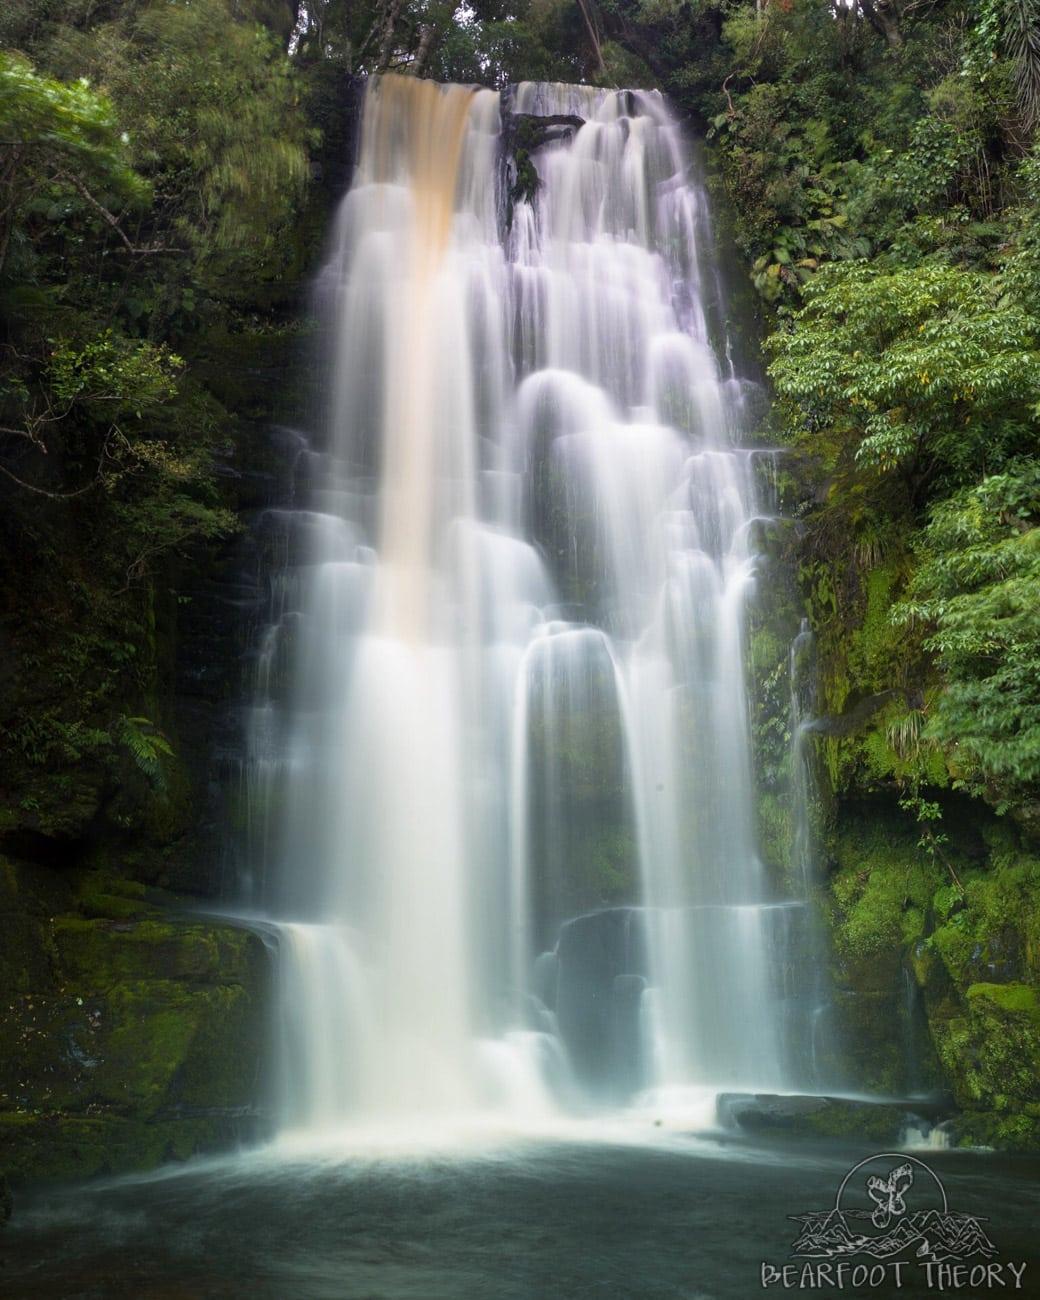 McLean Falls in the Catlins